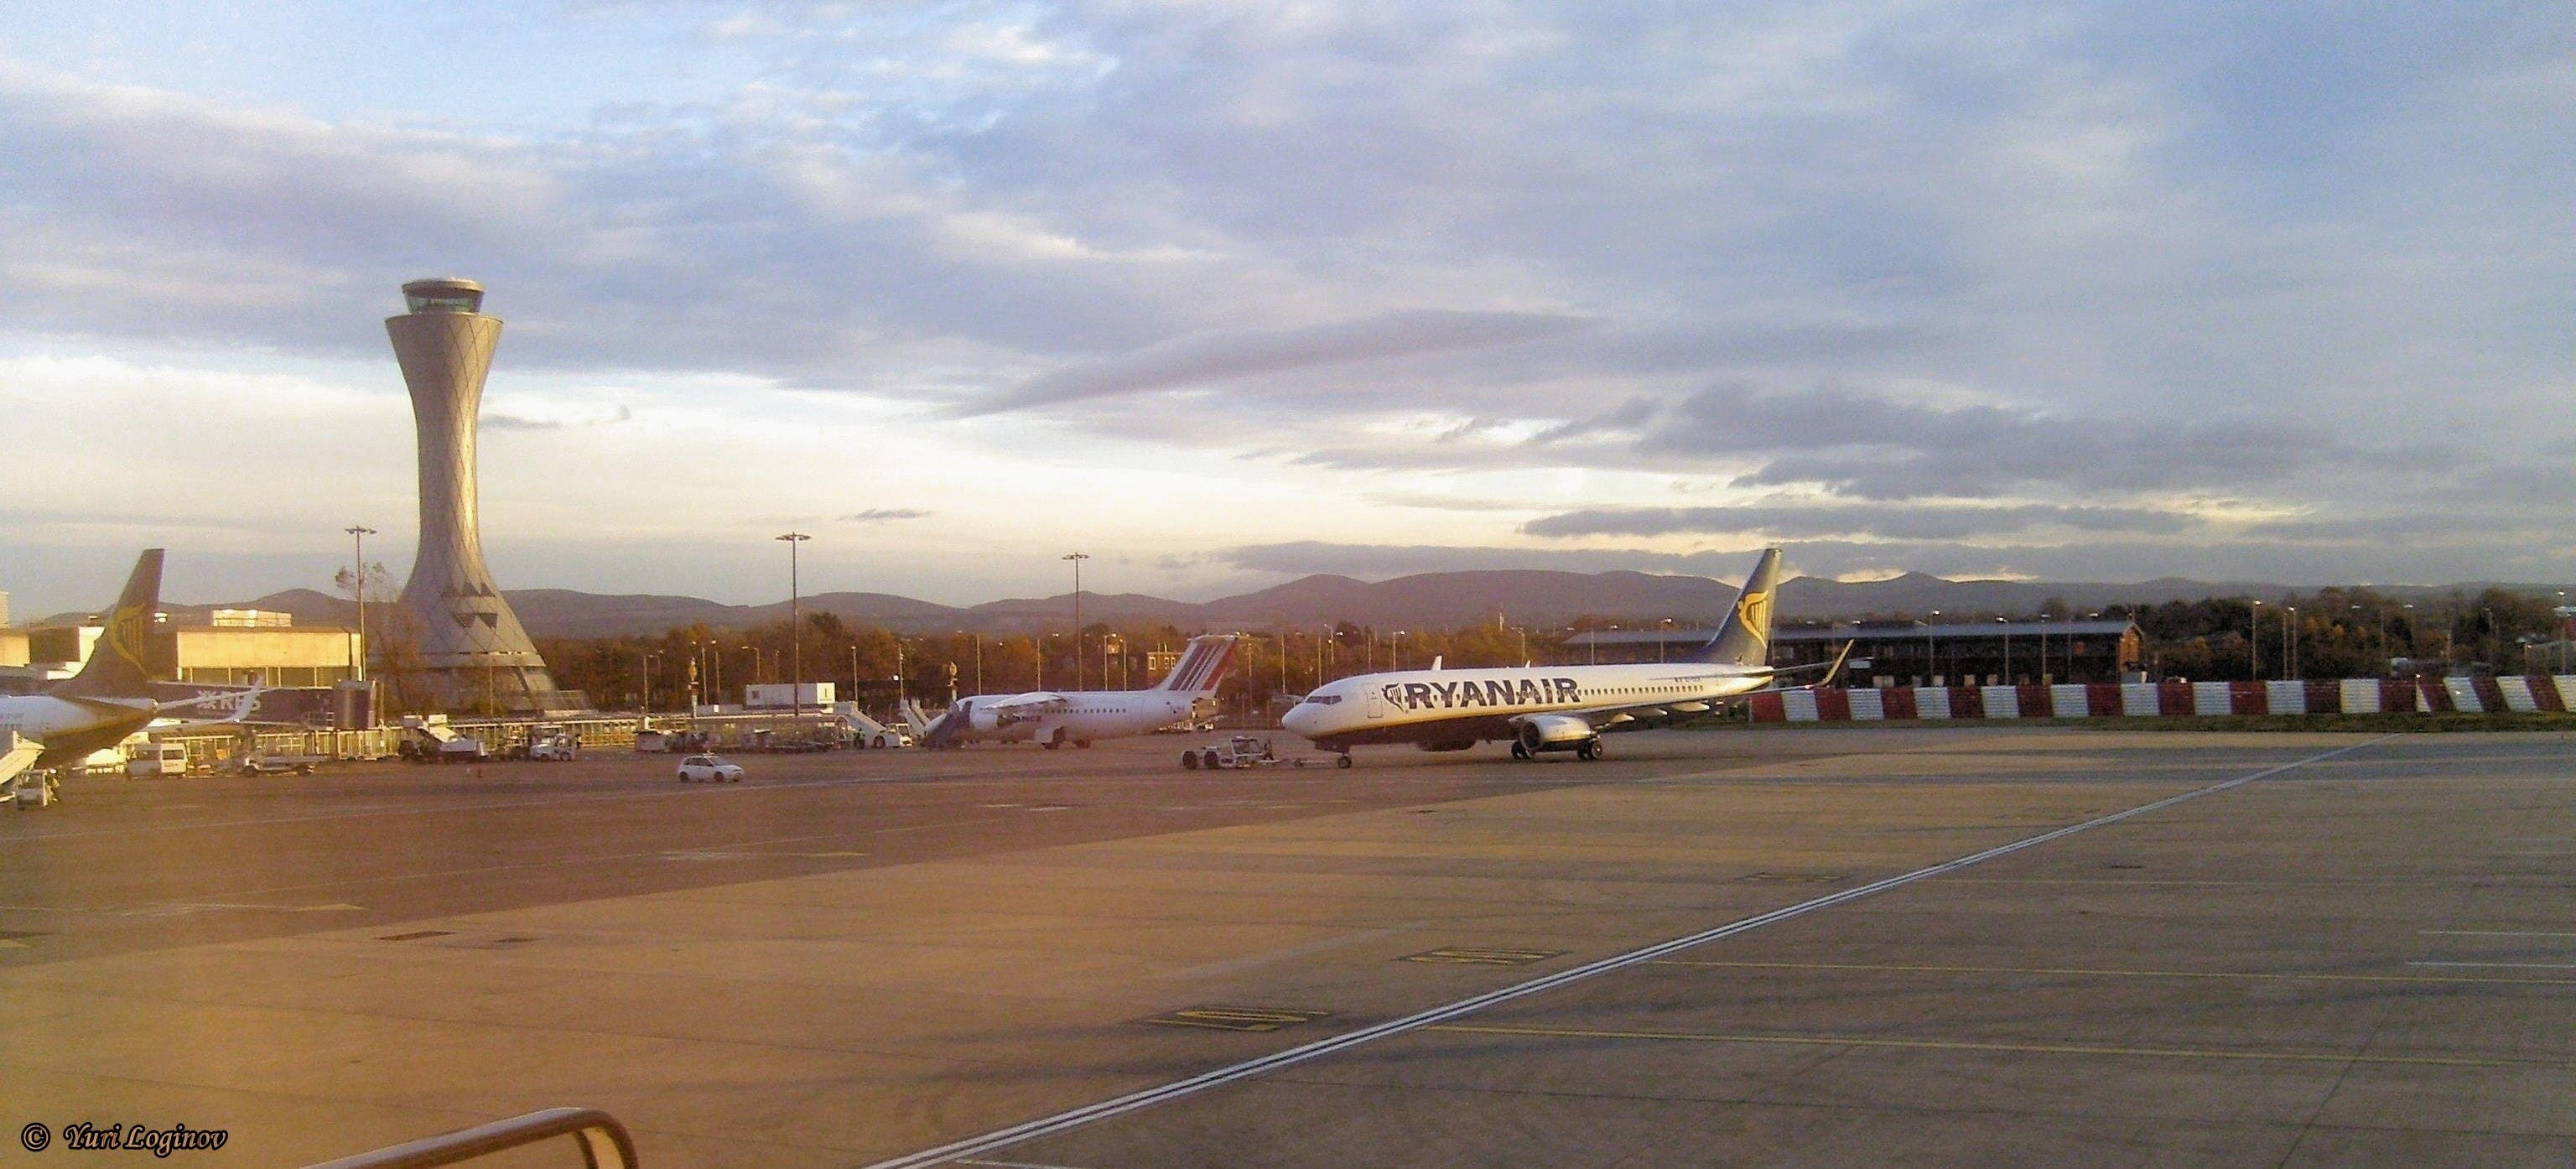 Free stock photo of scotland, edinburgh, united kingdom, Edinburgh airport